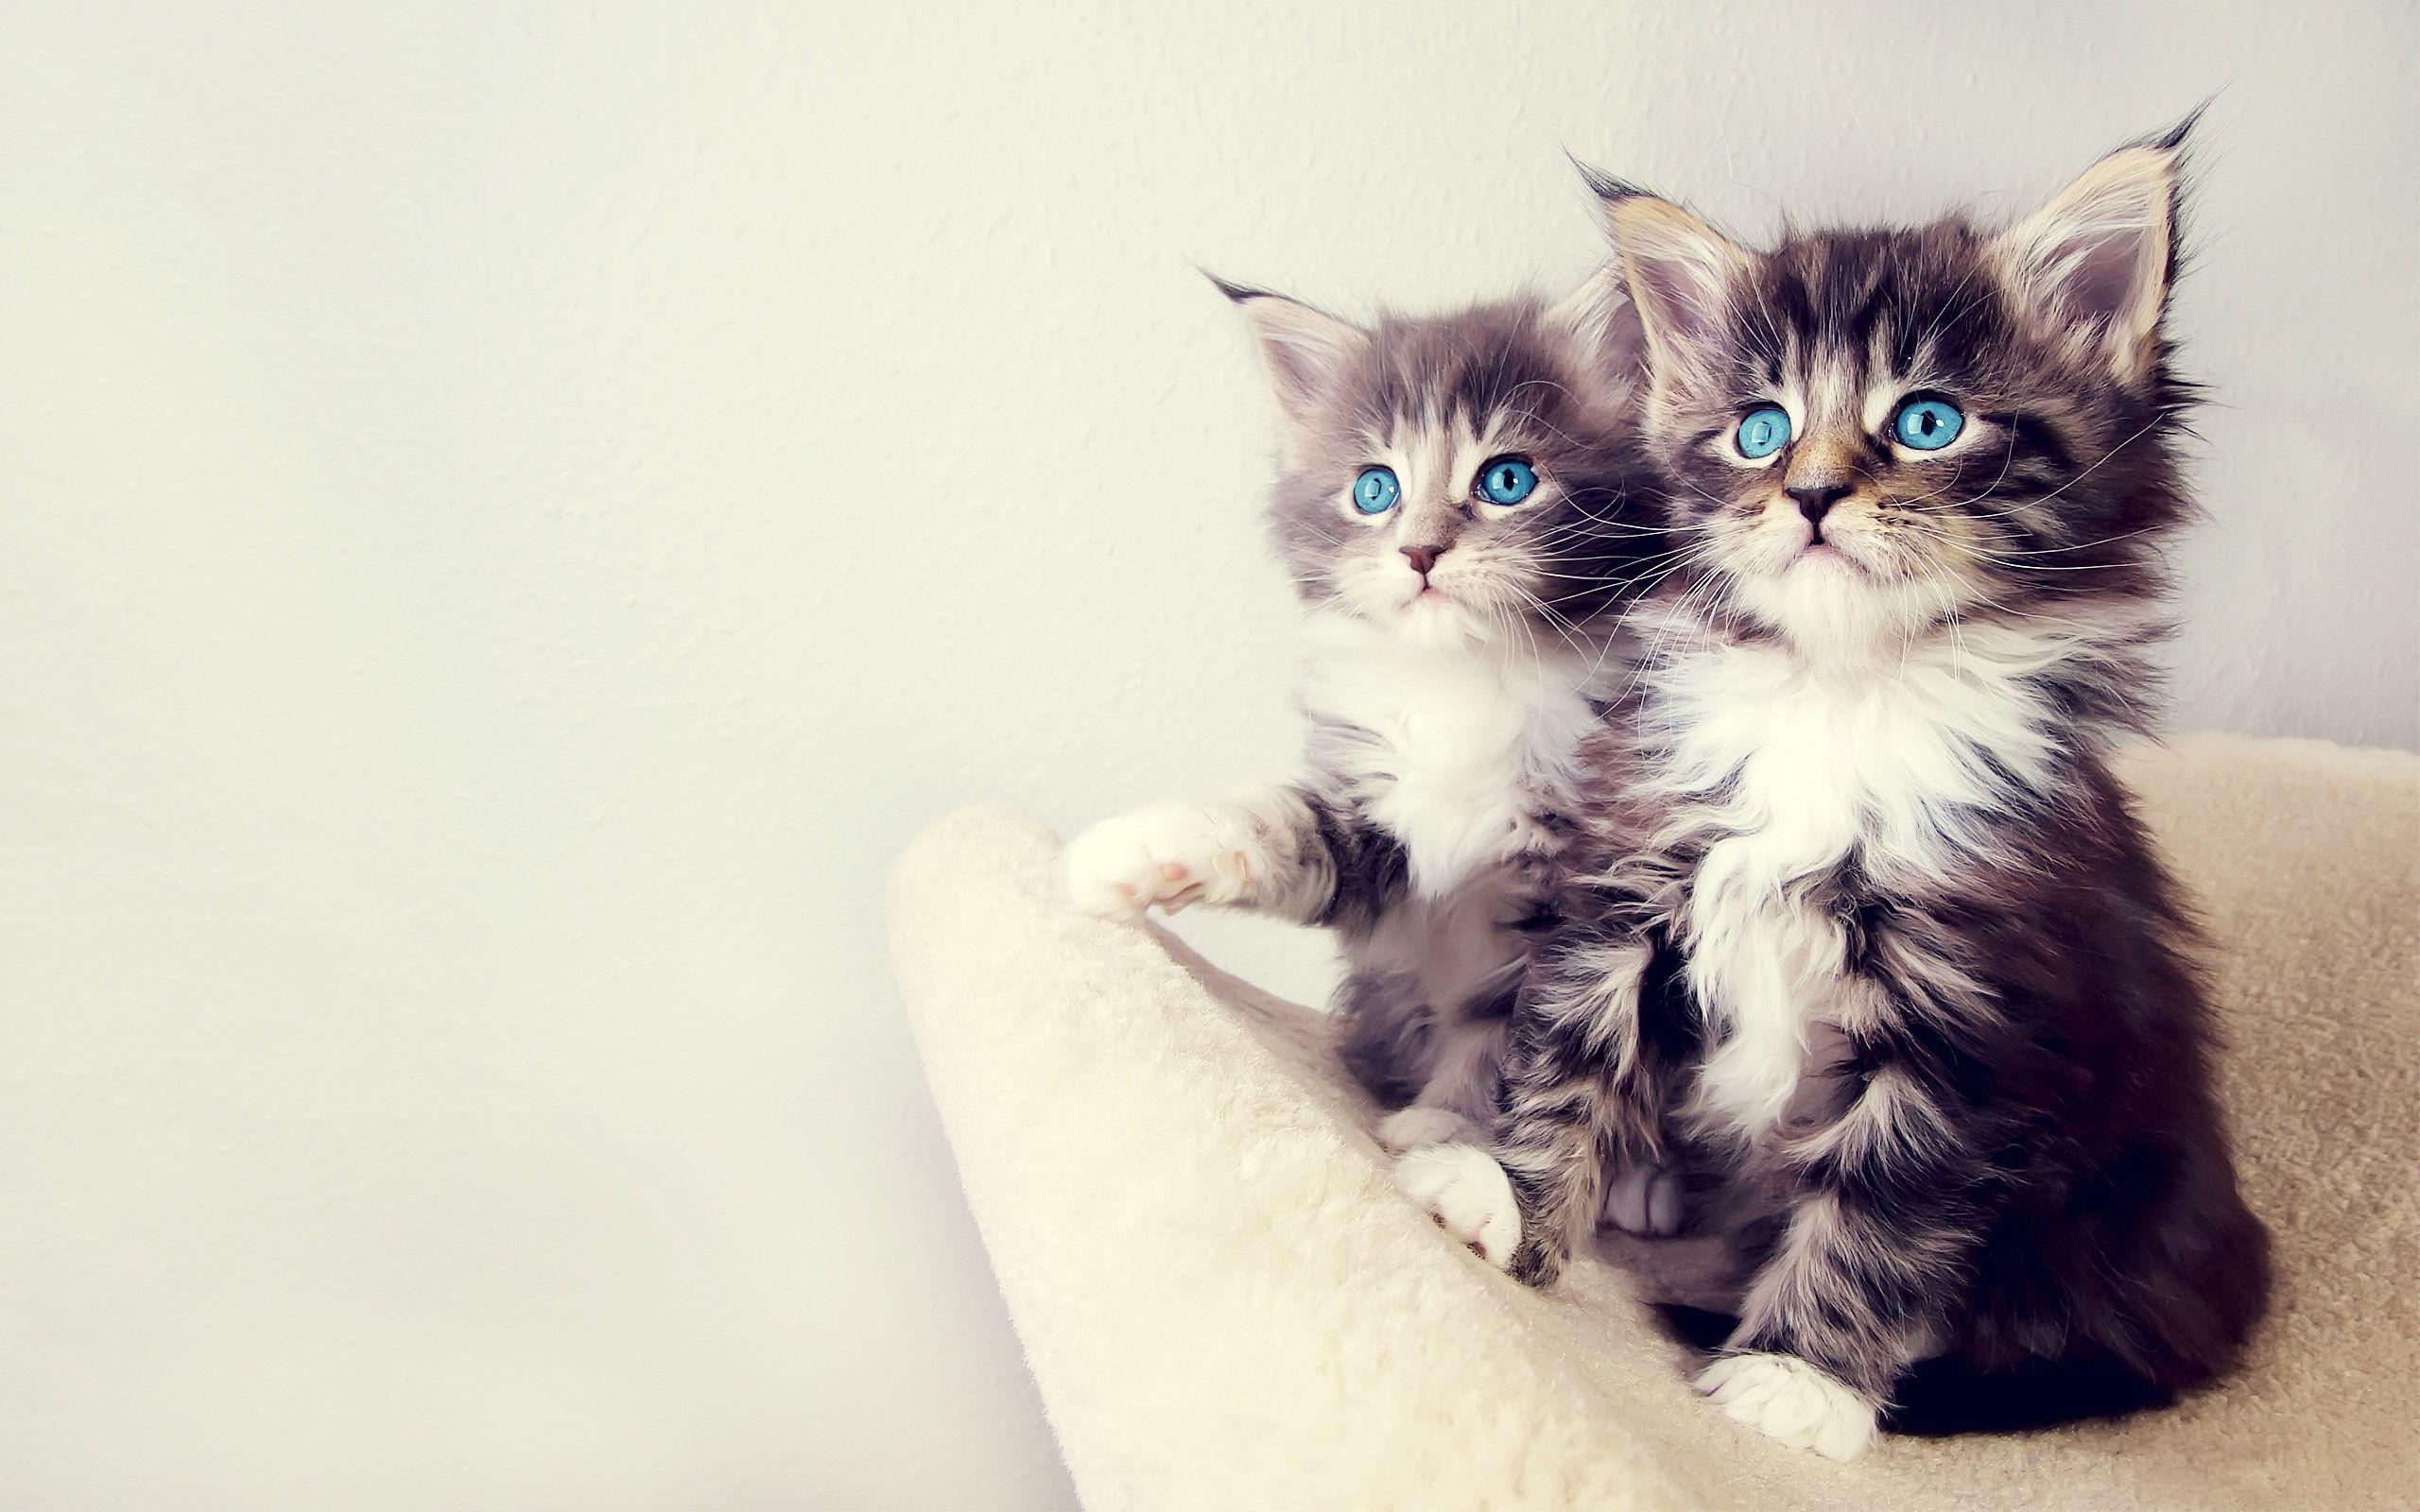 kitten desktop wallpaper blue eyes kittens desktop wallpaper